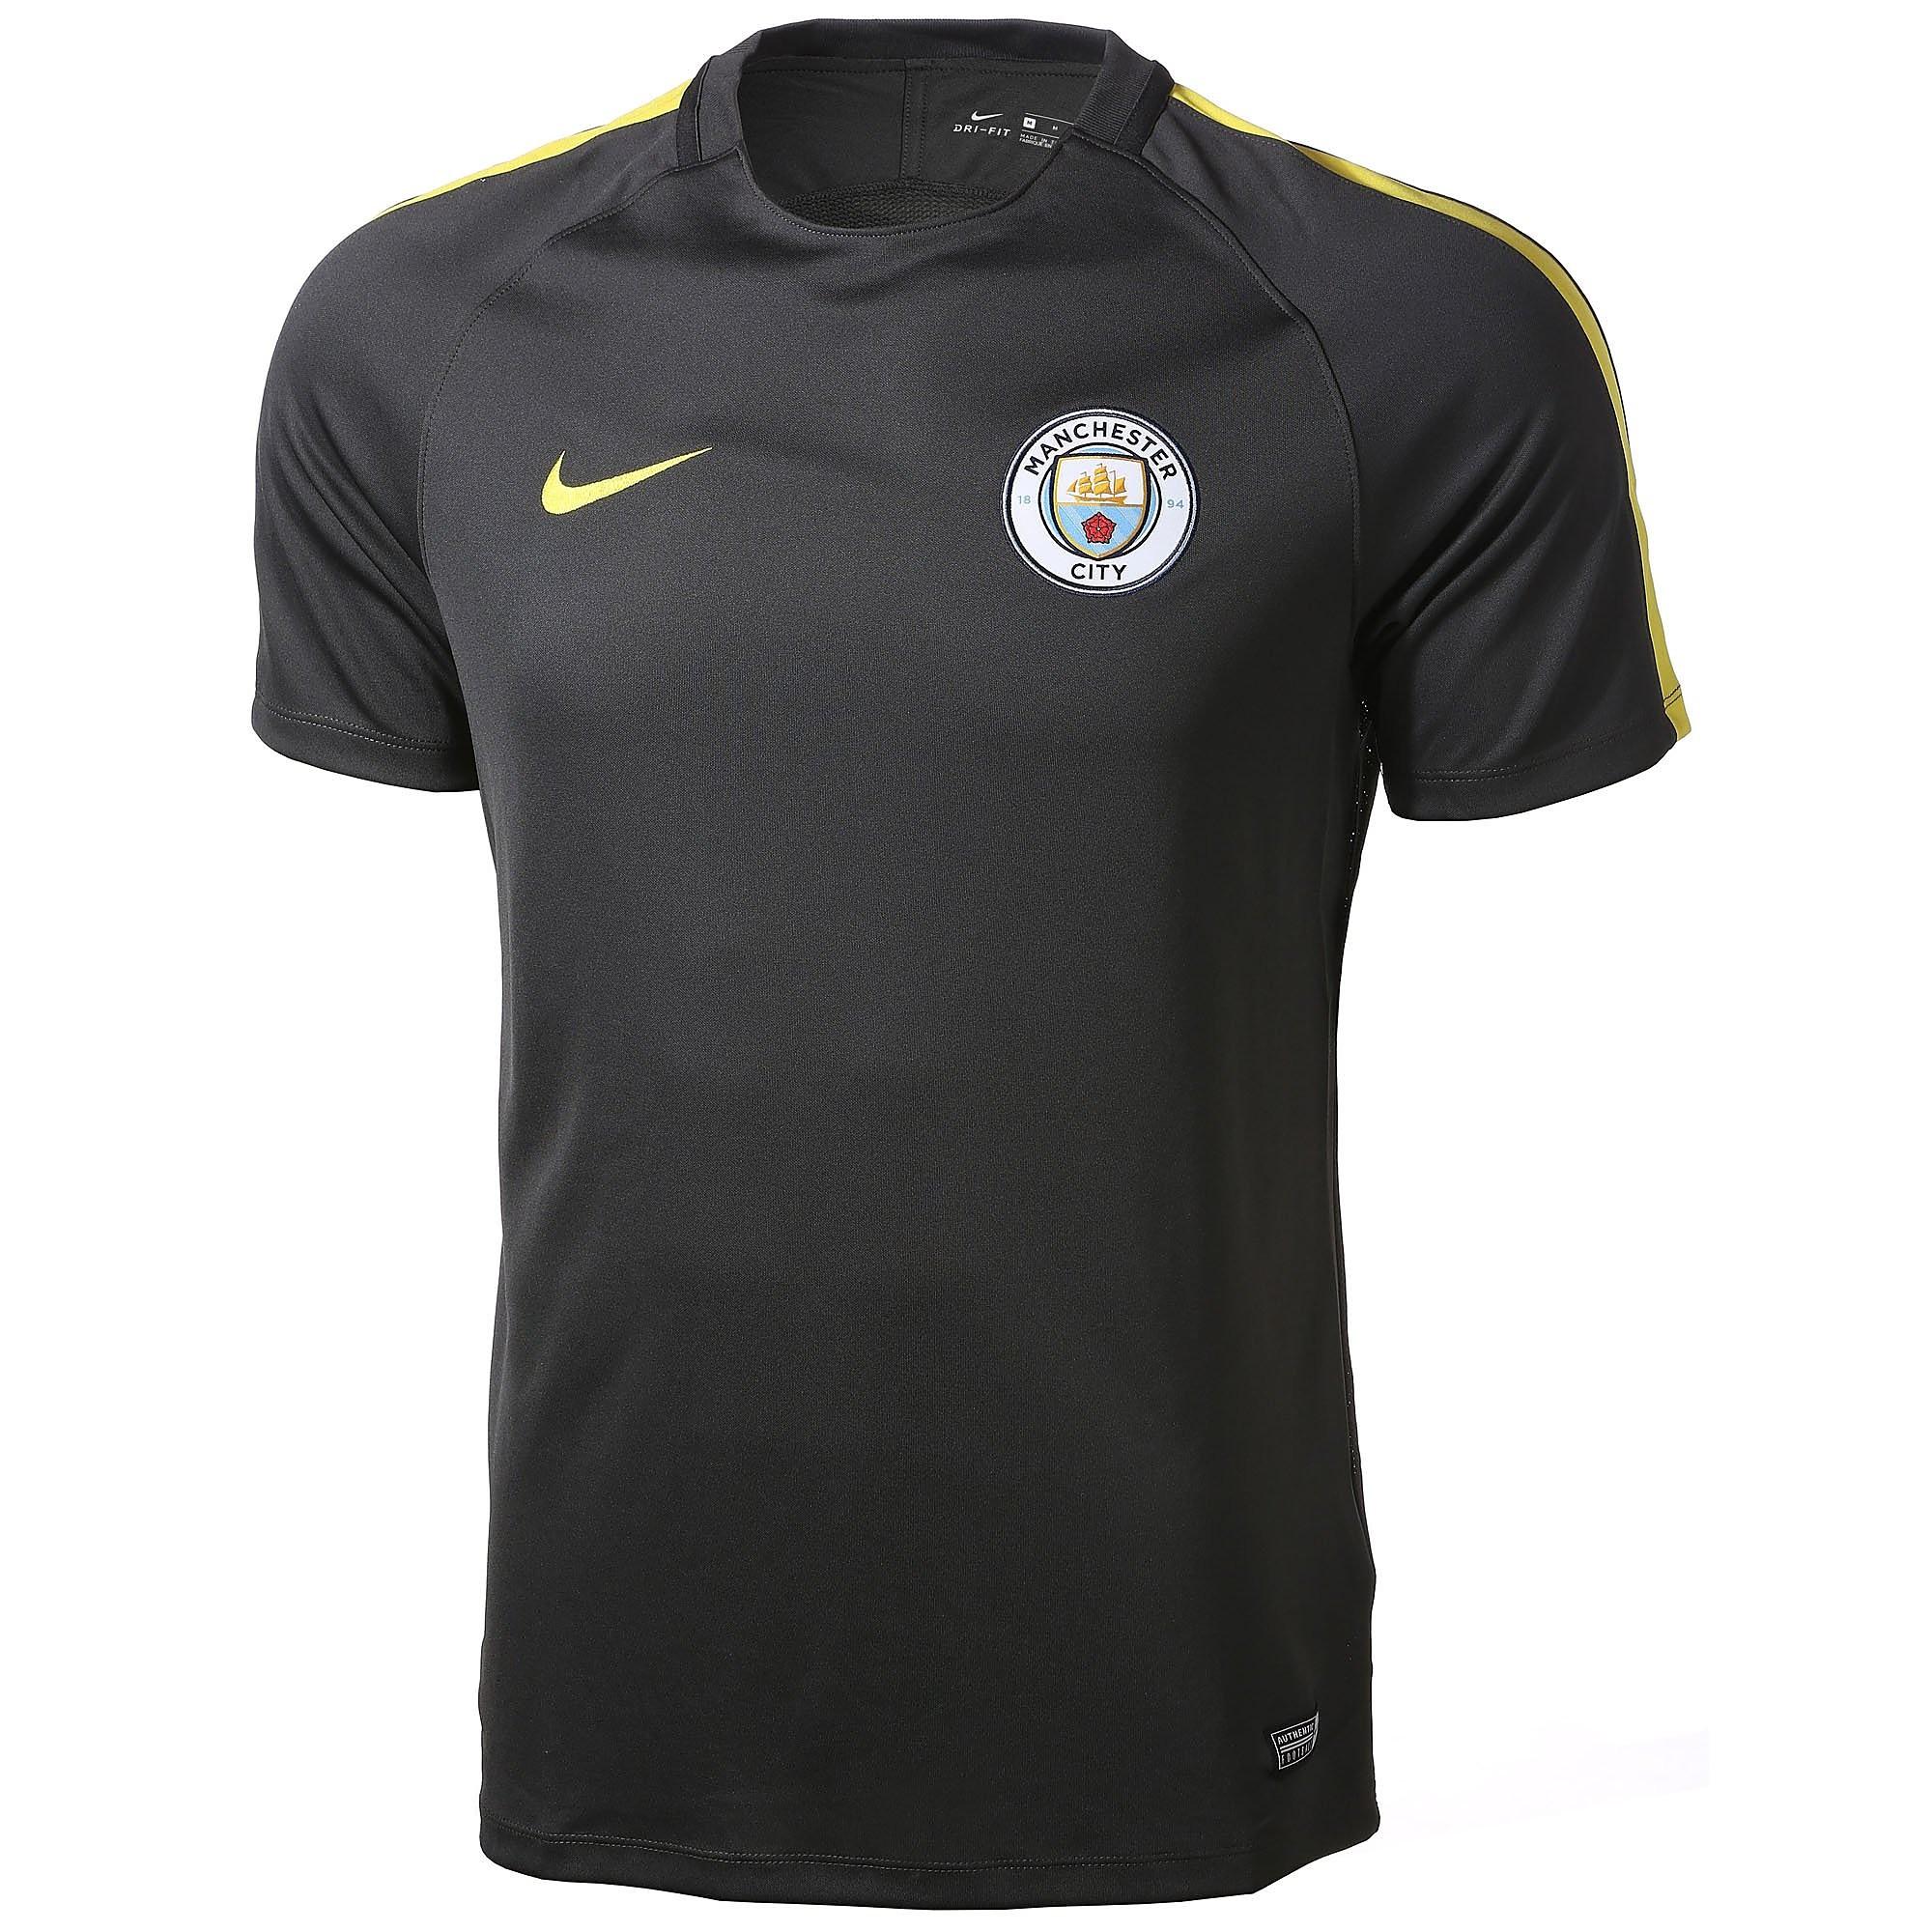 Nike MANCHESTER CITY FC TRAININGSSHIRT